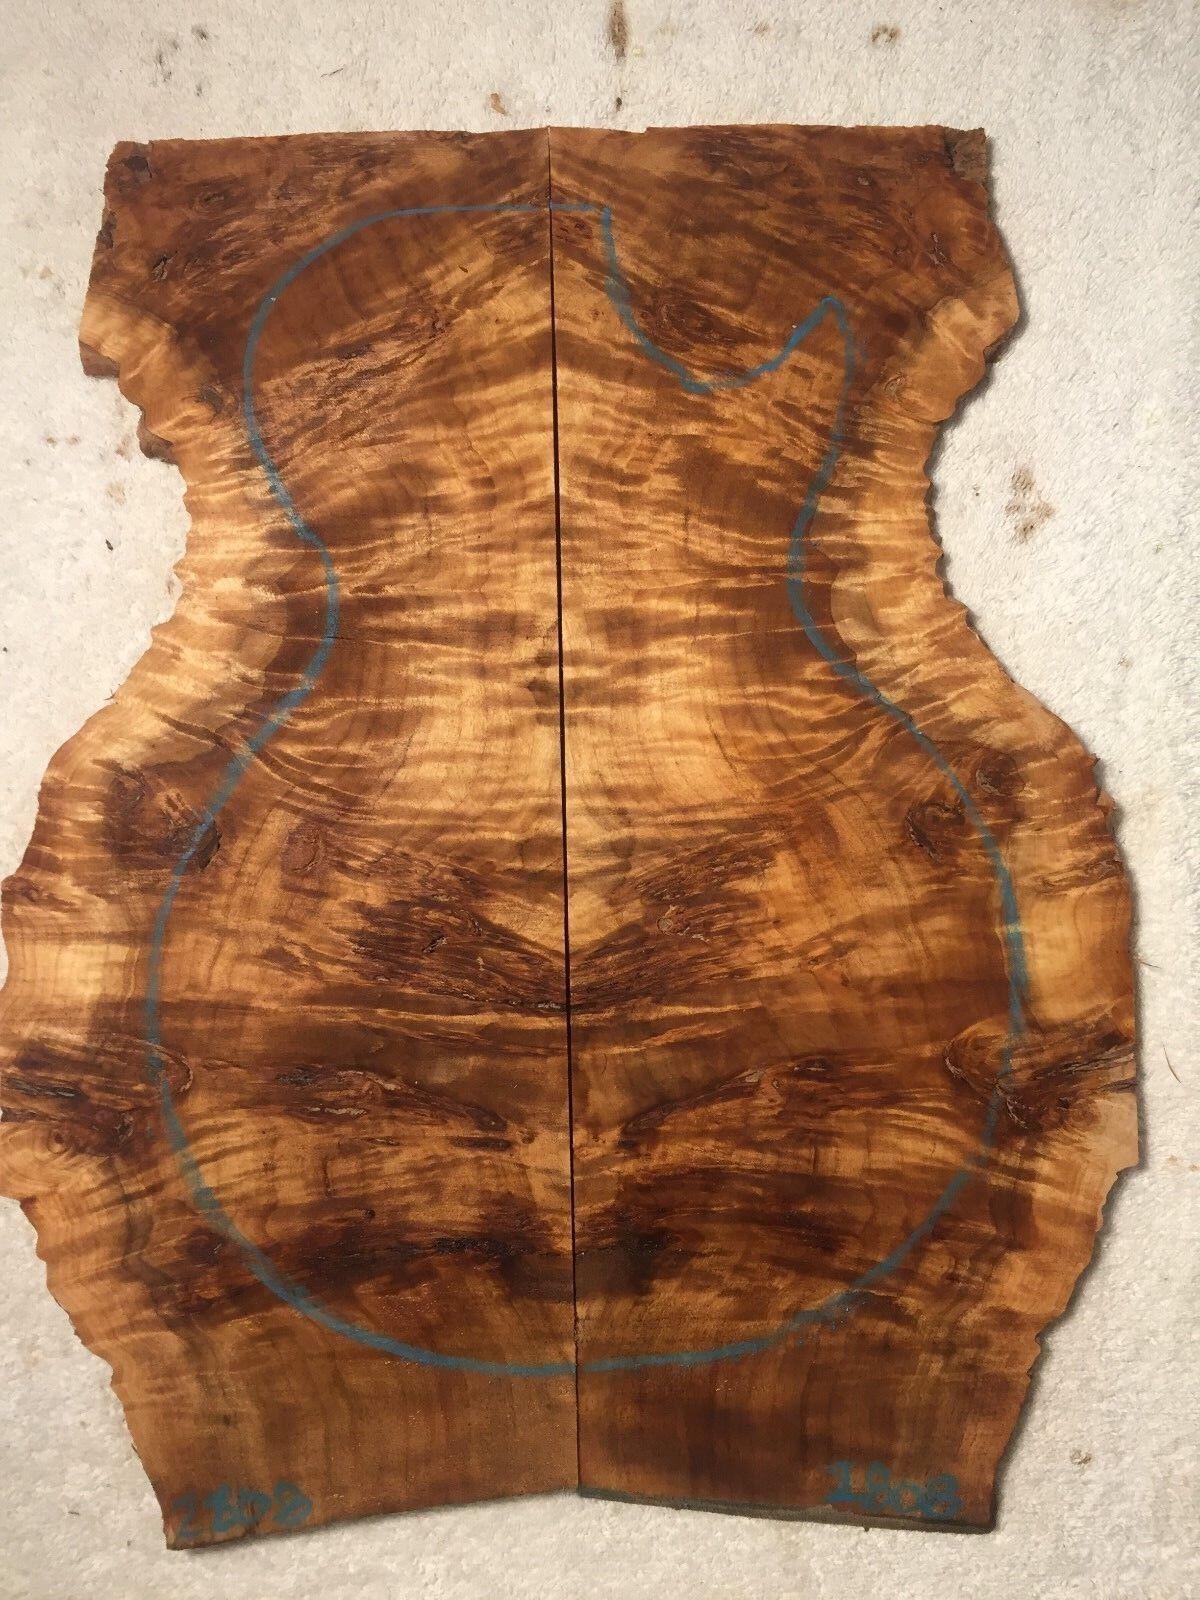 Poplar Burl book match set luthier guitar tone wood .42 x 12-17 x 20